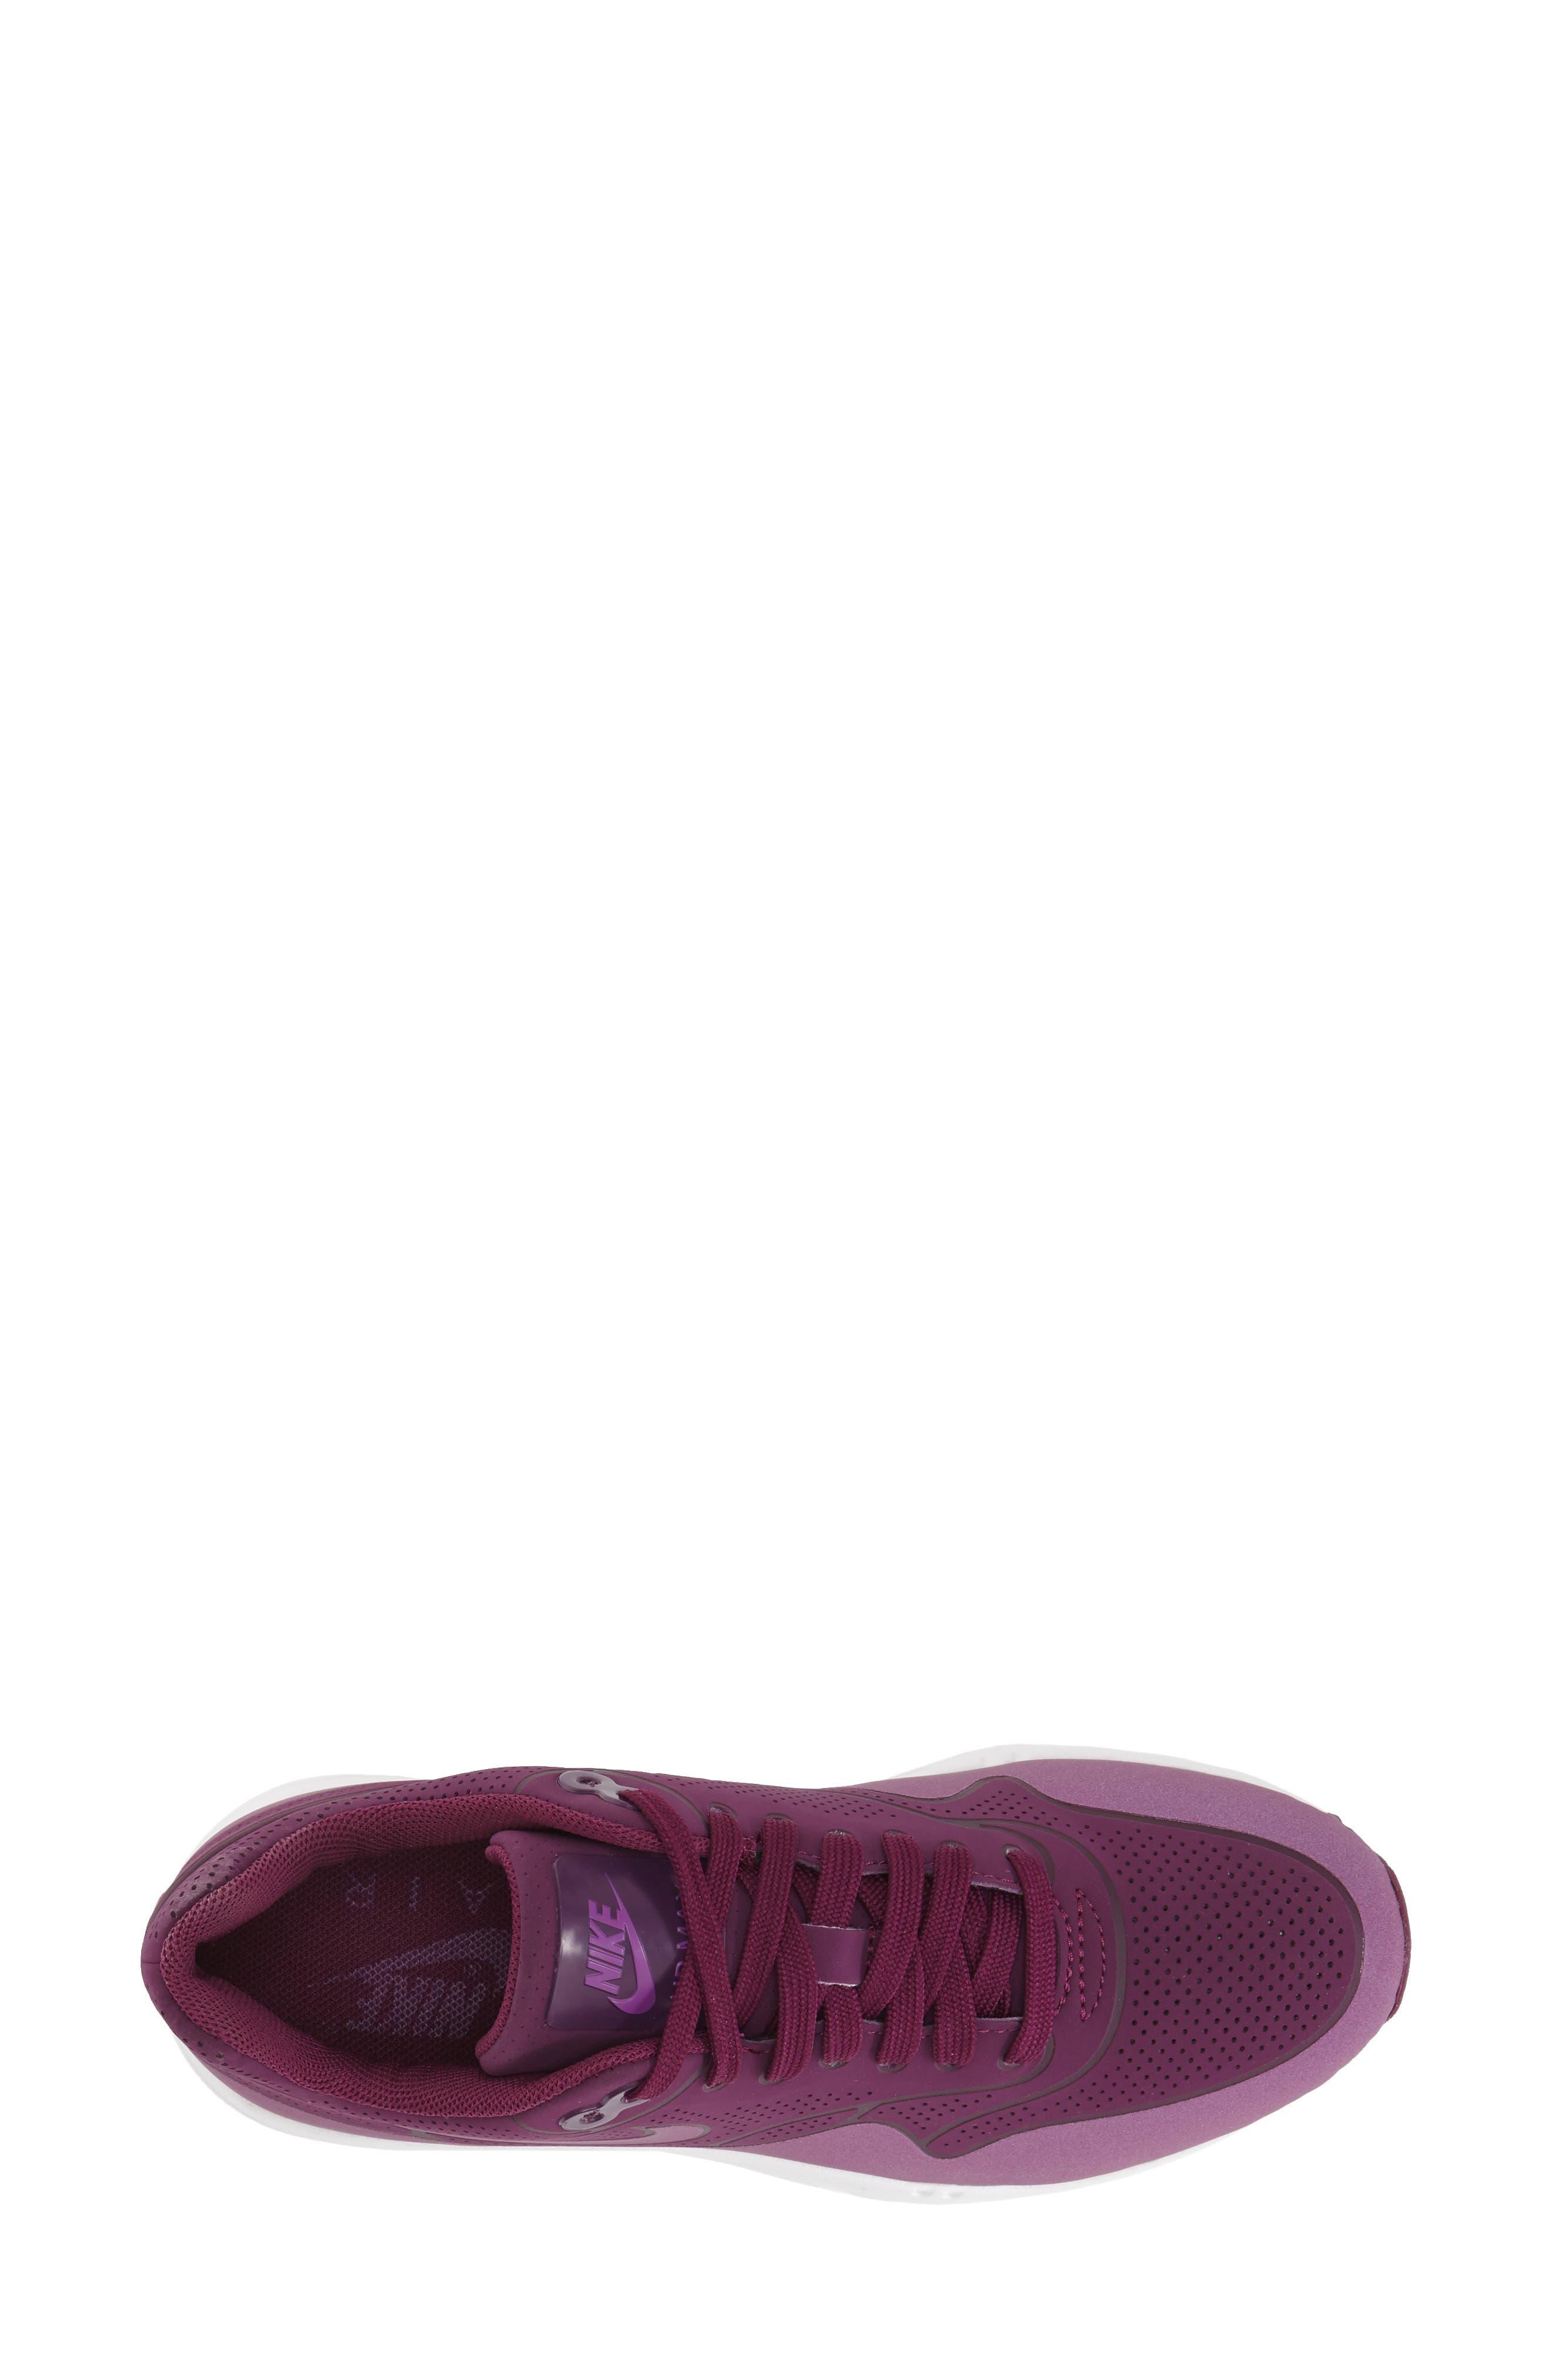 ,                             'Air Max 1 - Ultra Moire' Sneaker,                             Alternate thumbnail 89, color,                             500